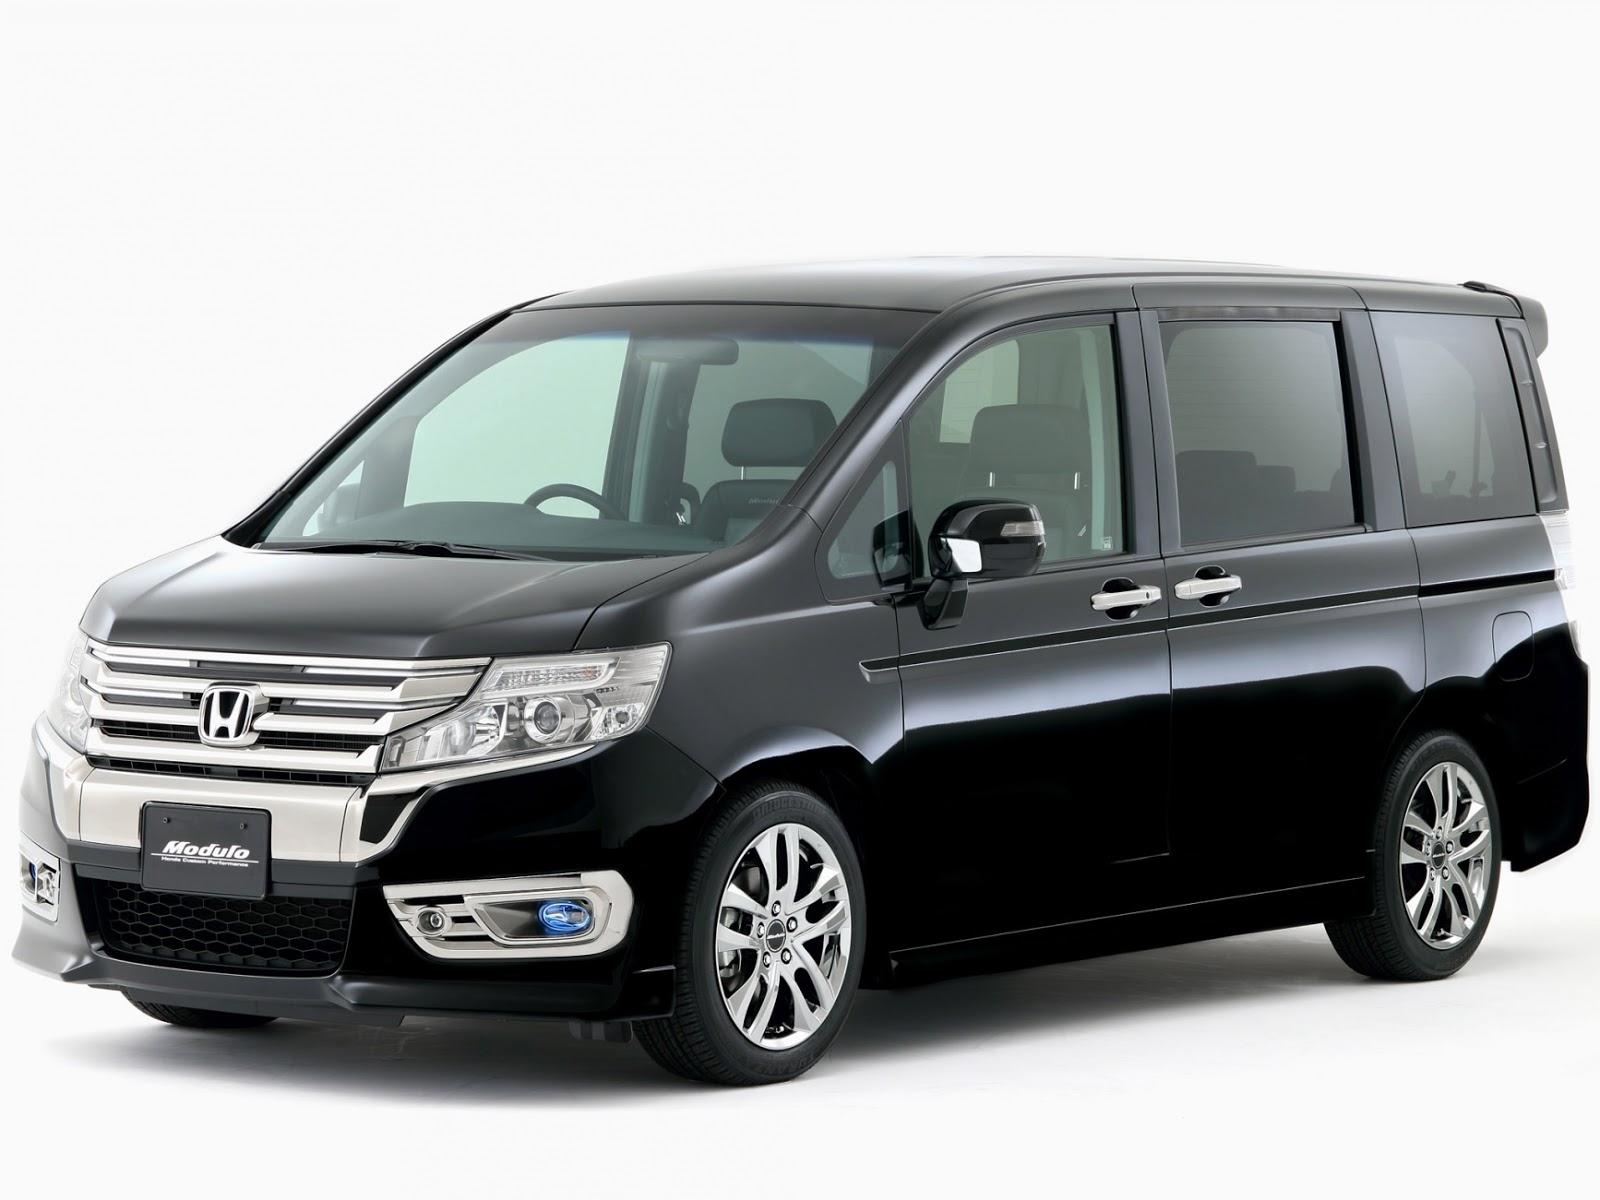 Honda Stepwgn IV 2009 - 2015 Compact MPV #5